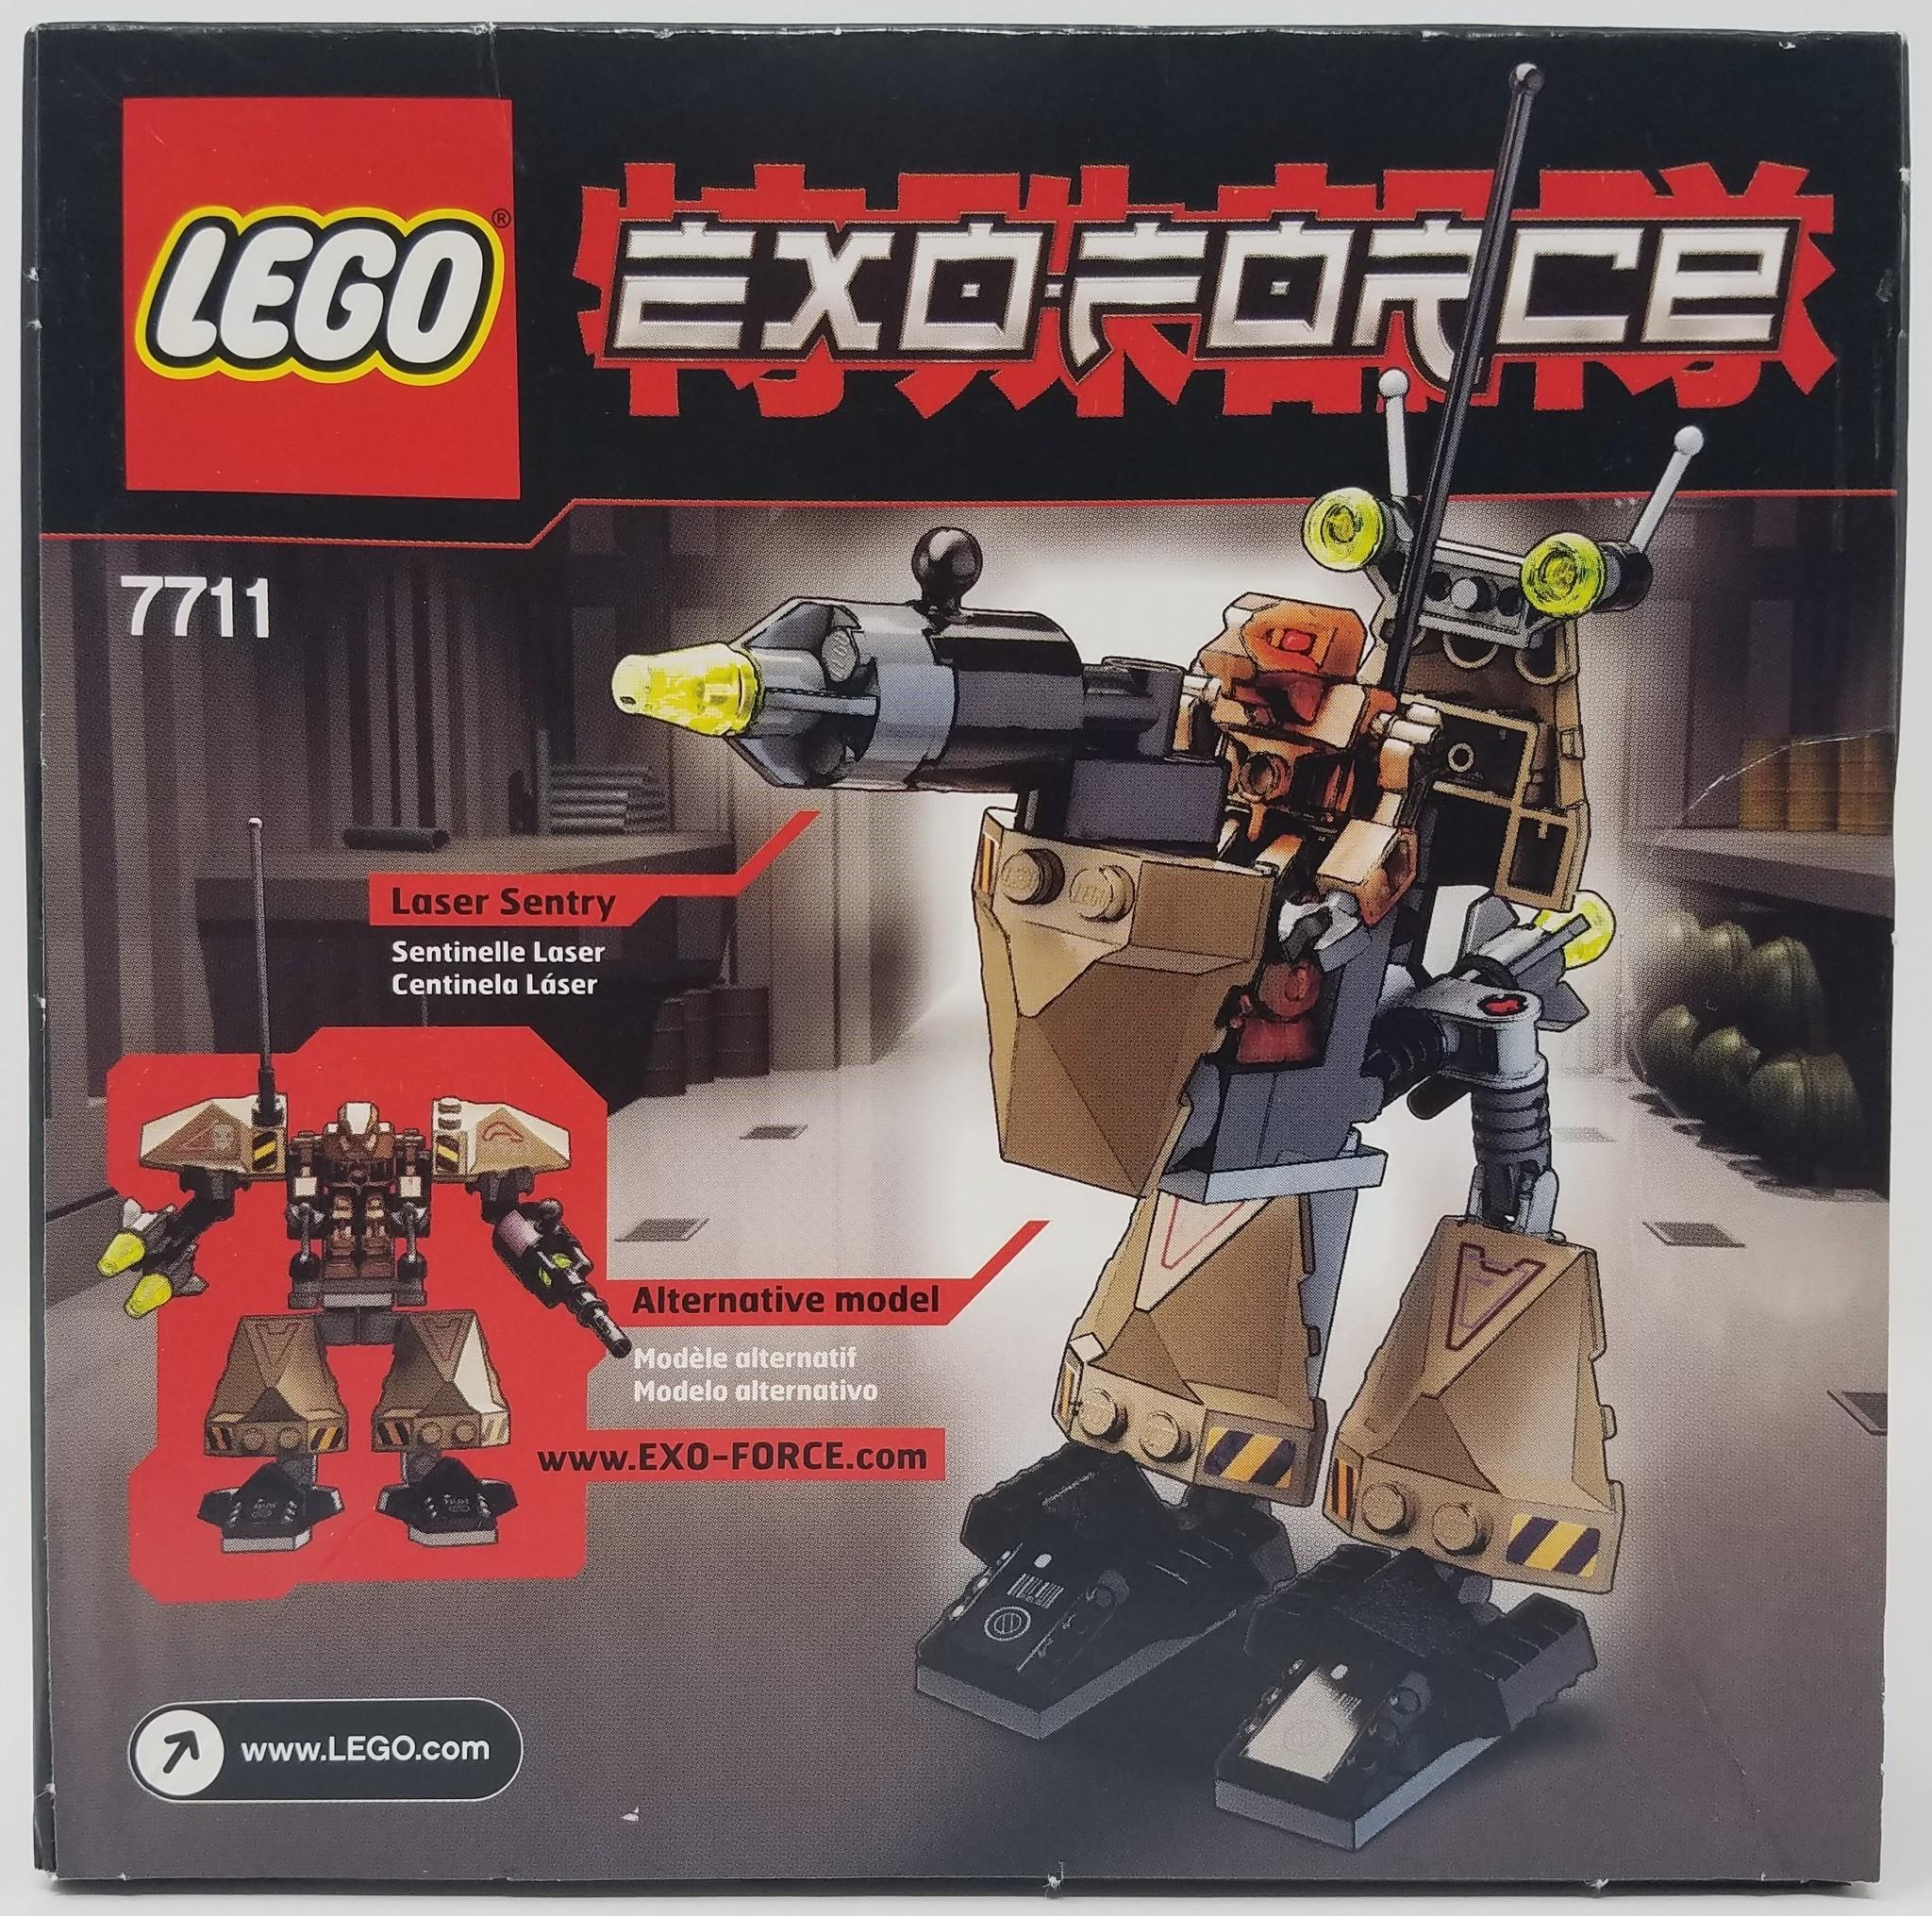 LEGO LEGO #7711 Exo-Force: Robot Sentry